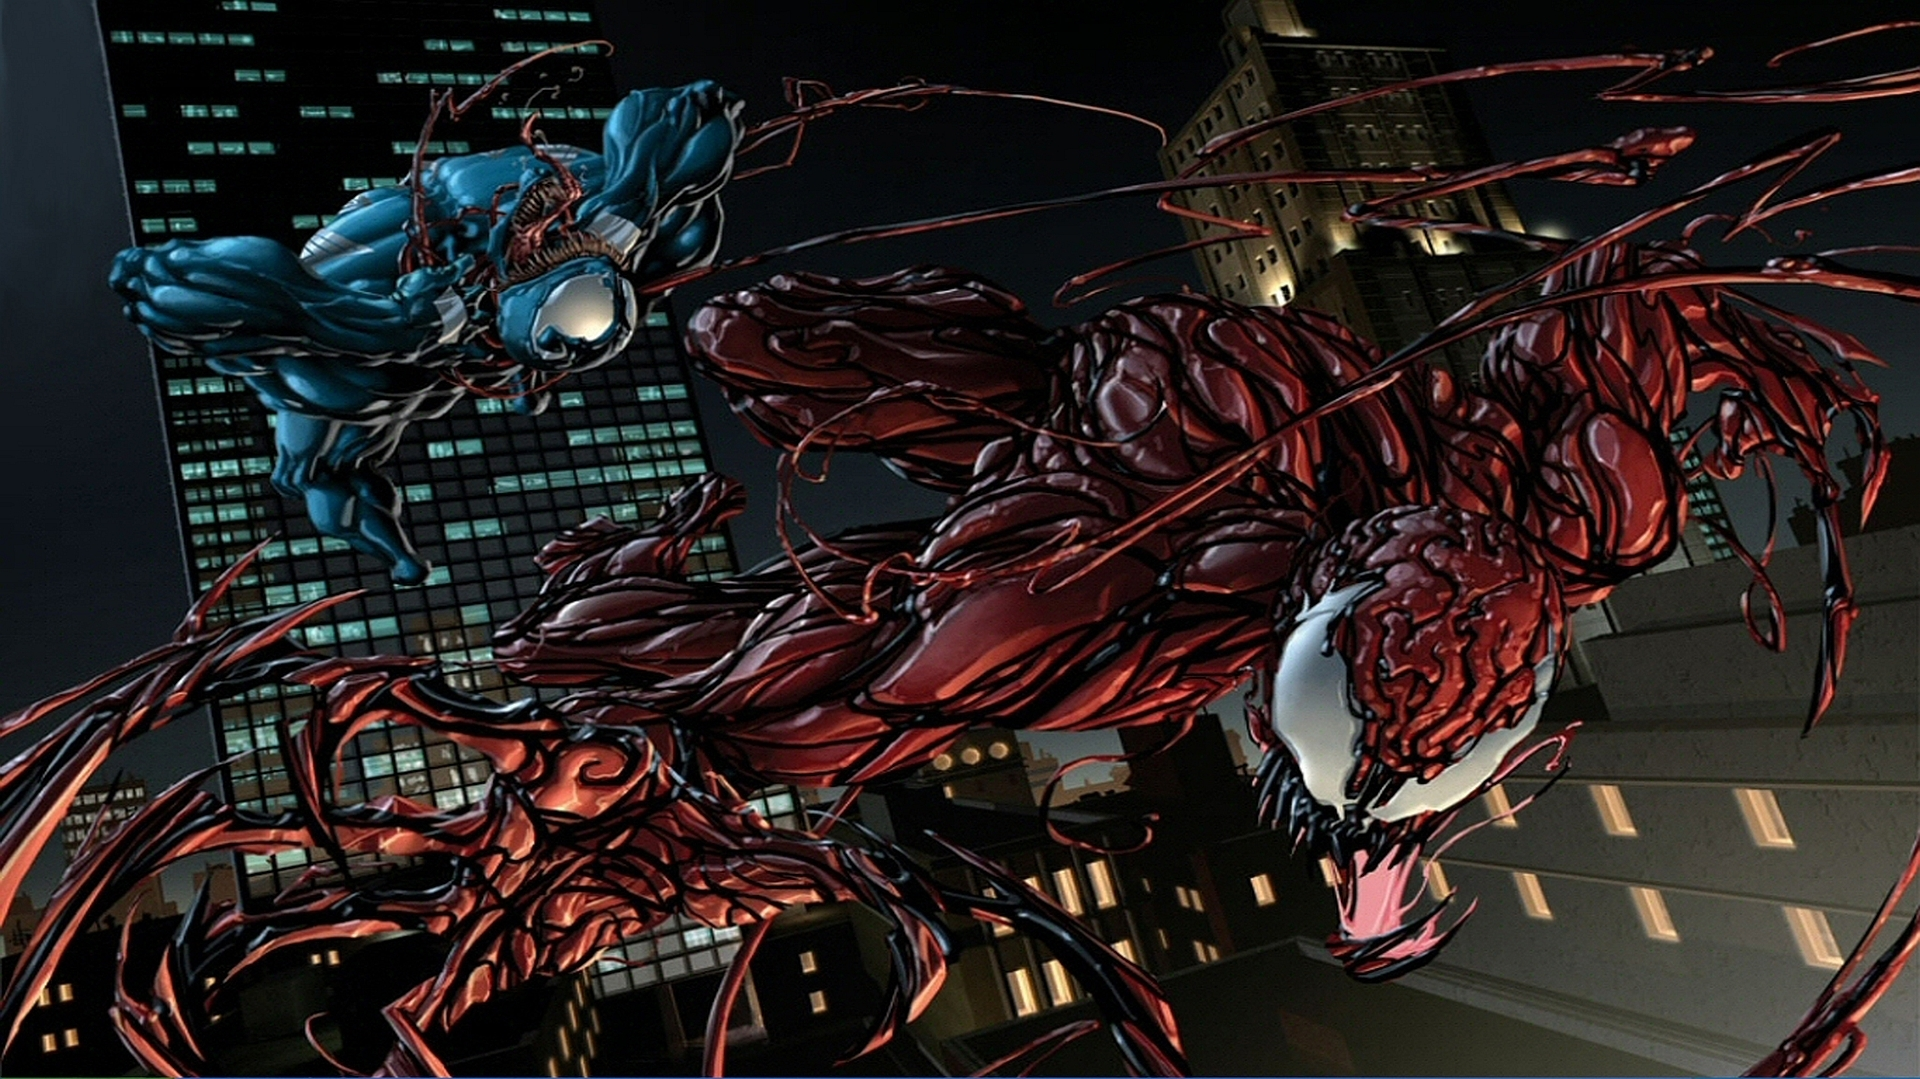 venom vs carnage fond d'écran and arrière-plan | 1920x1079 | id:495898